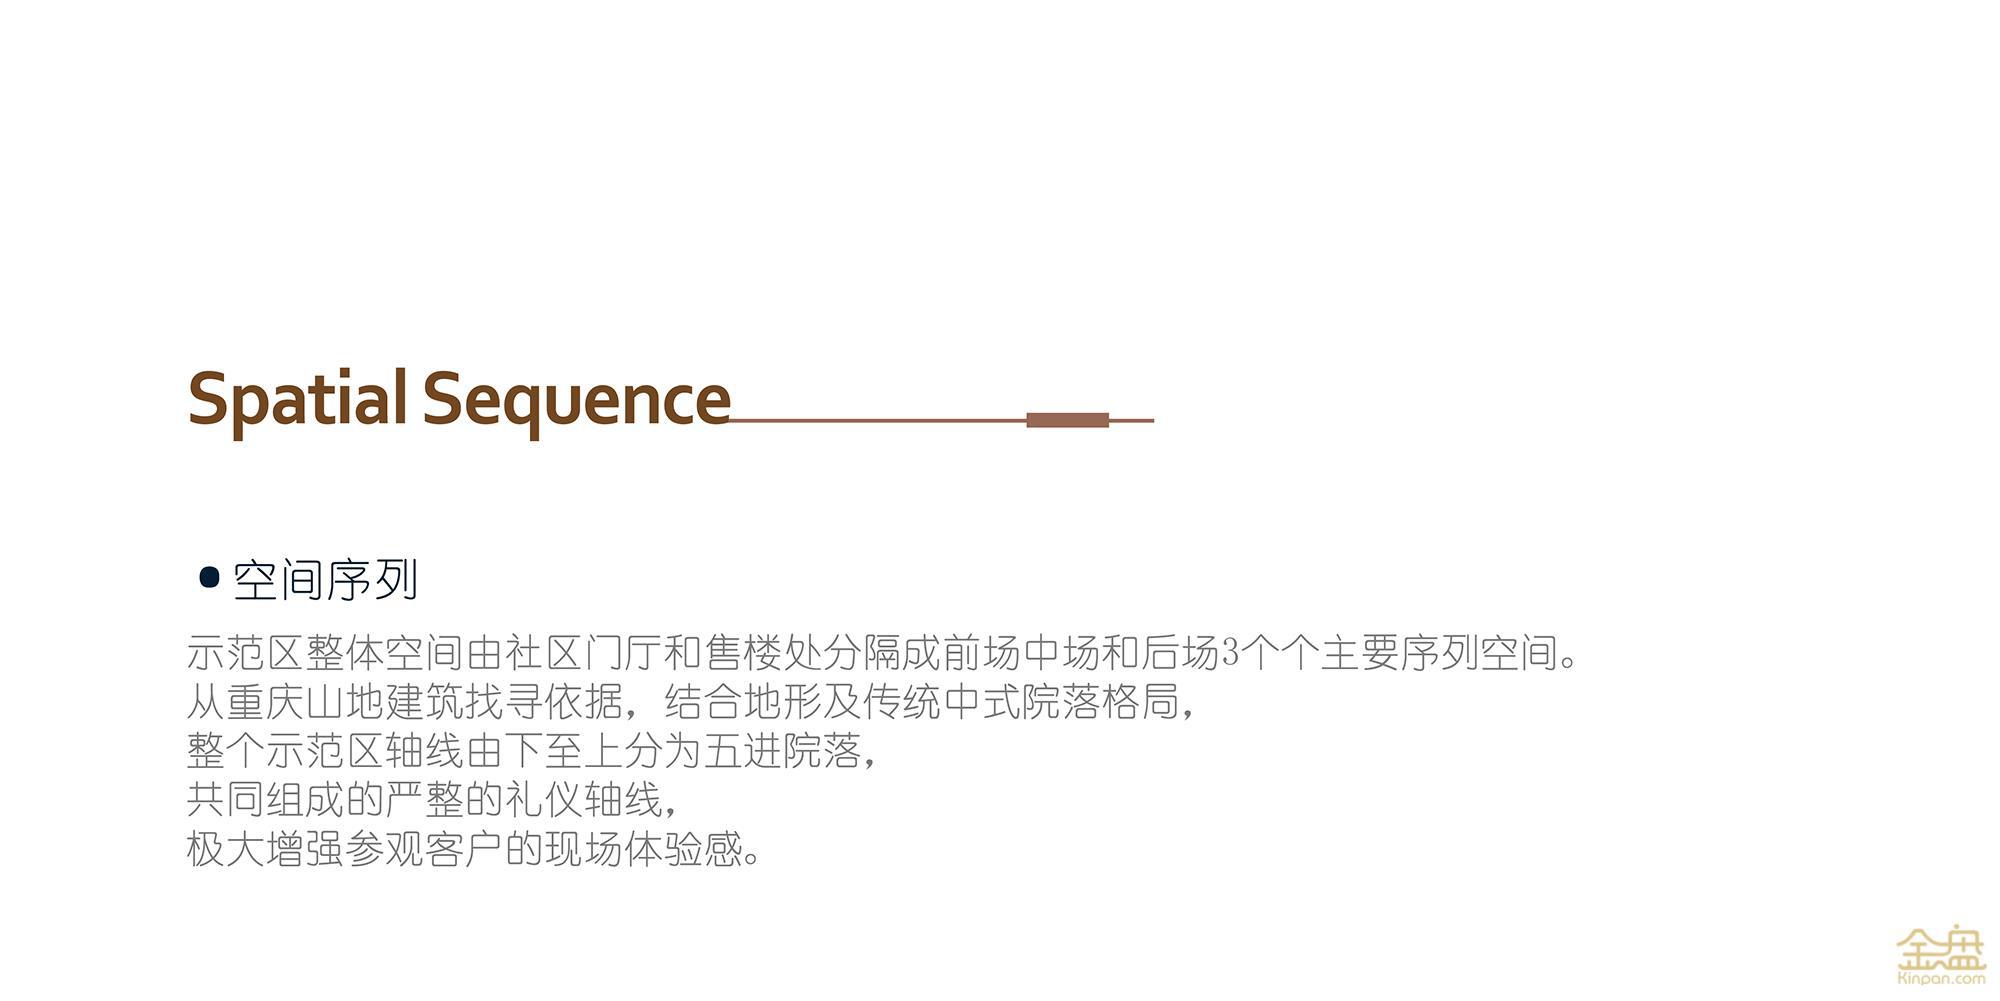 http://img.zhux2.com/editor1558458588921318.jpg